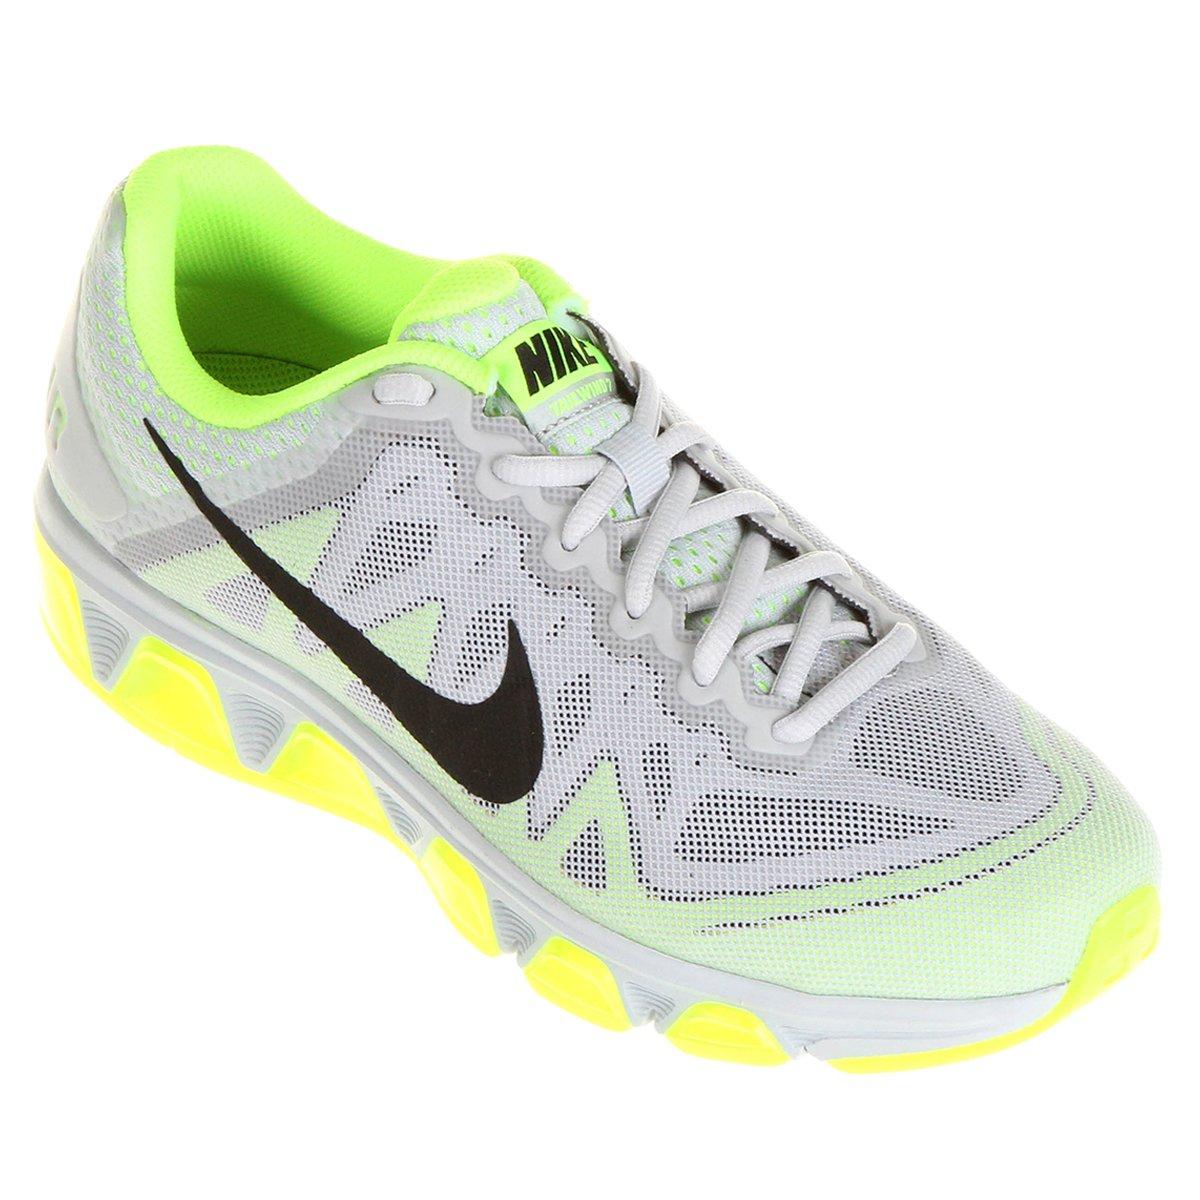 buy nike air max tailwind 5 netshoes white ea691 7f680